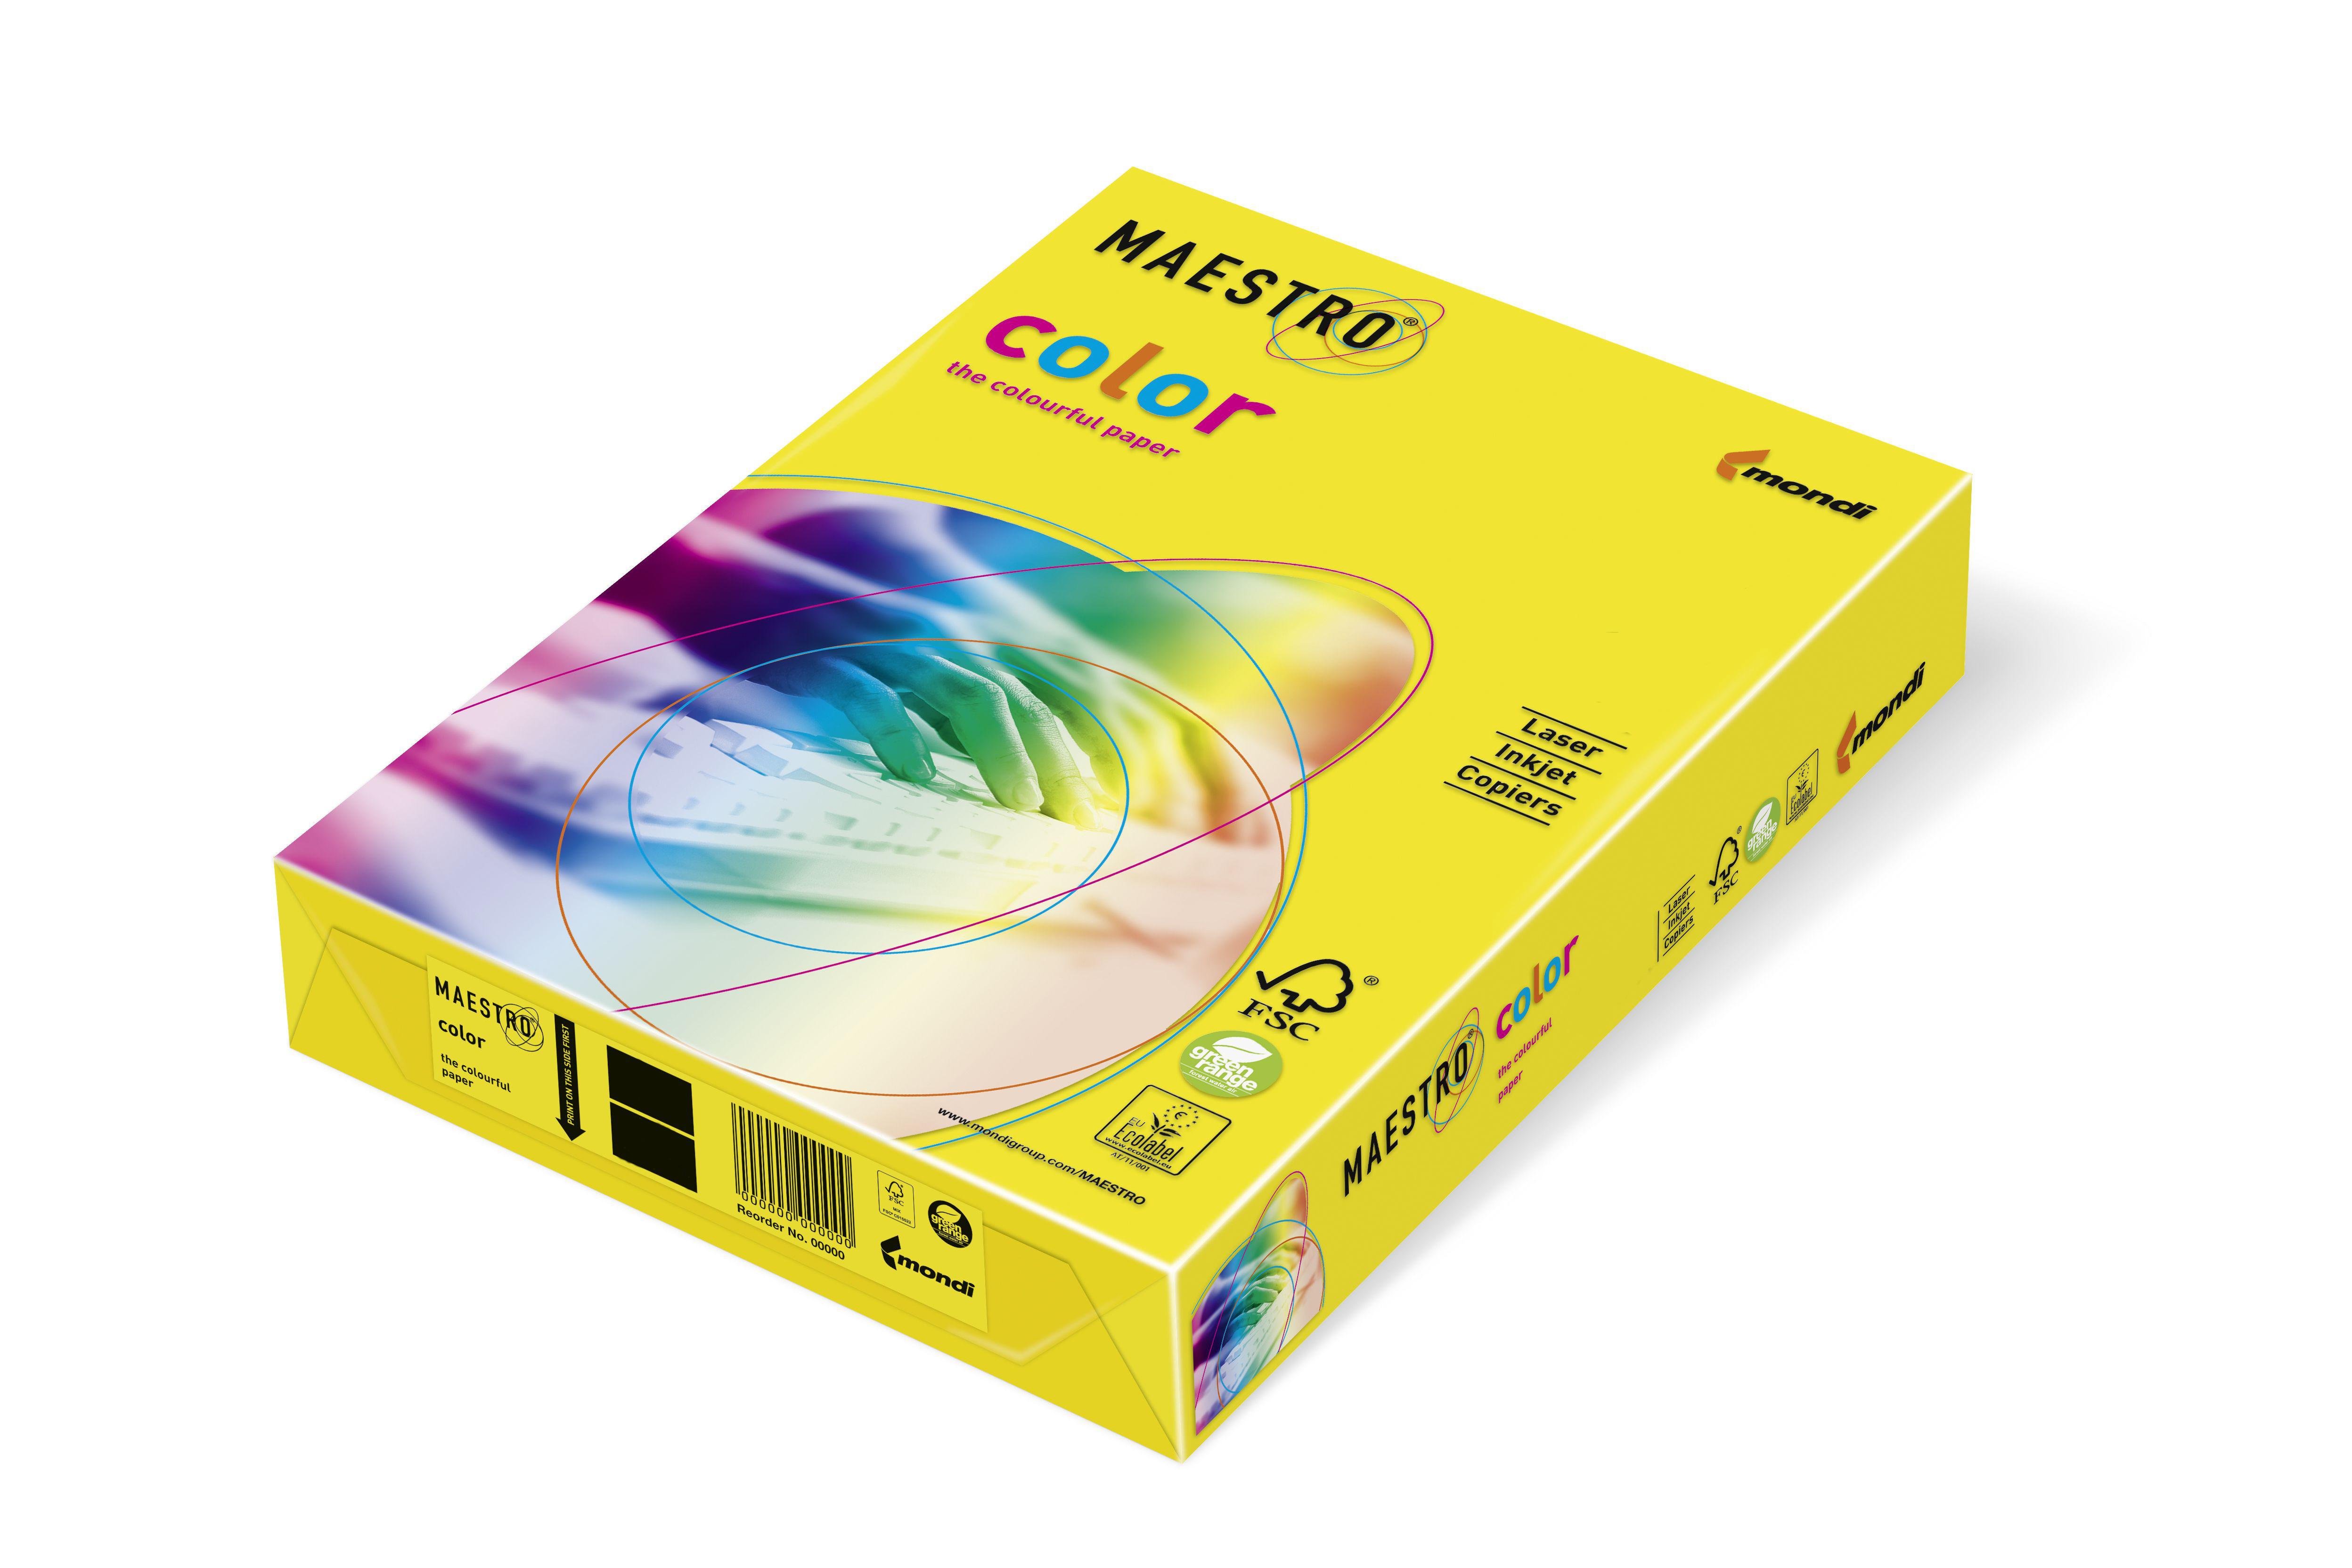 Mondi Maestro Color zitronengelb 80g/m² DIN-A3 - 500 Blatt ZG34